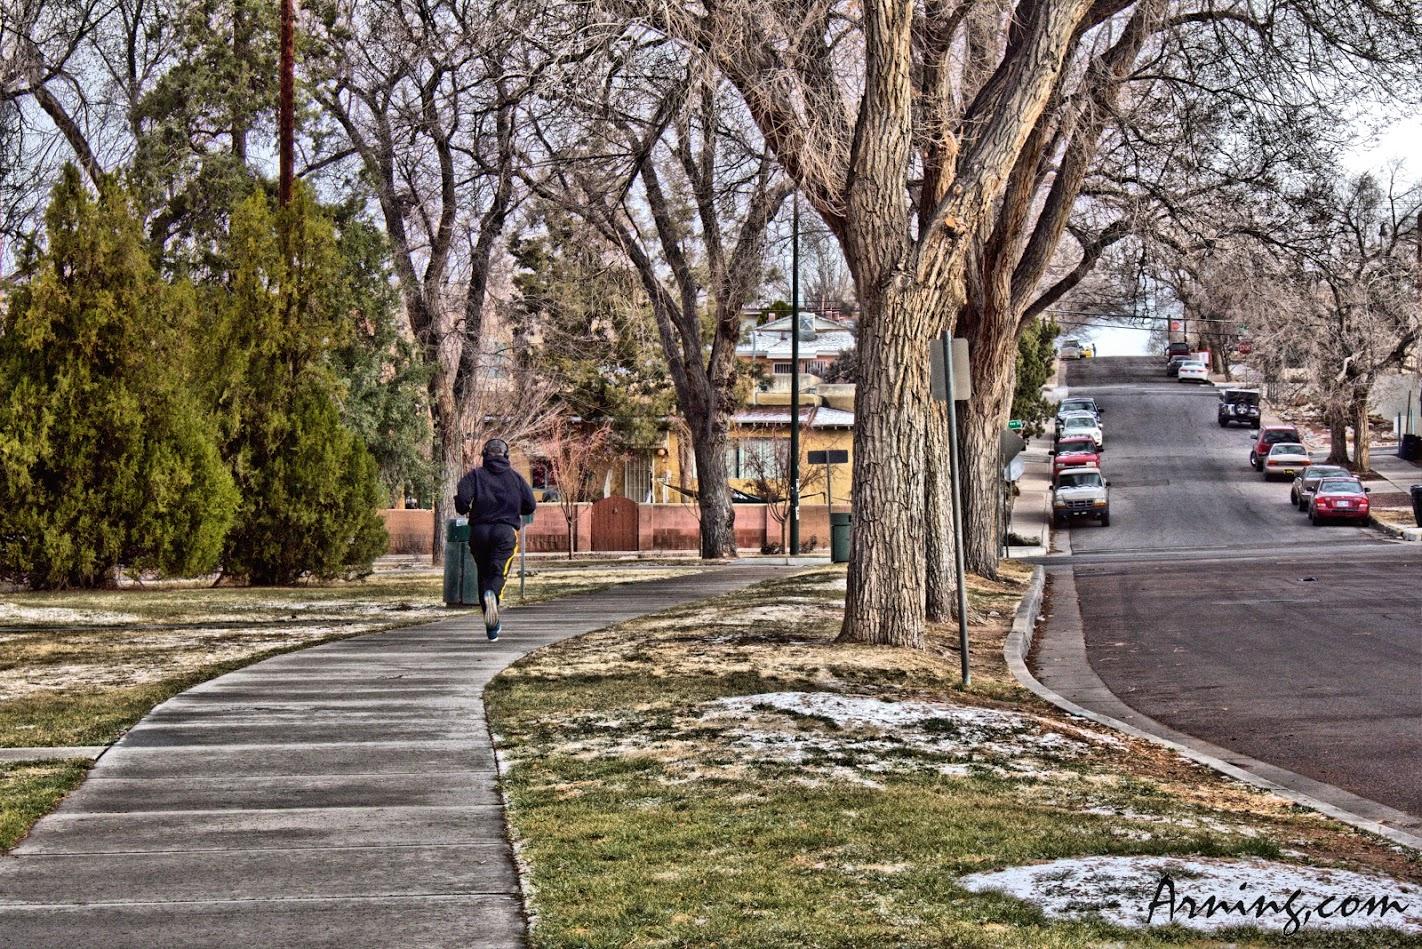 Roosevelt Park — City of Albuquerque